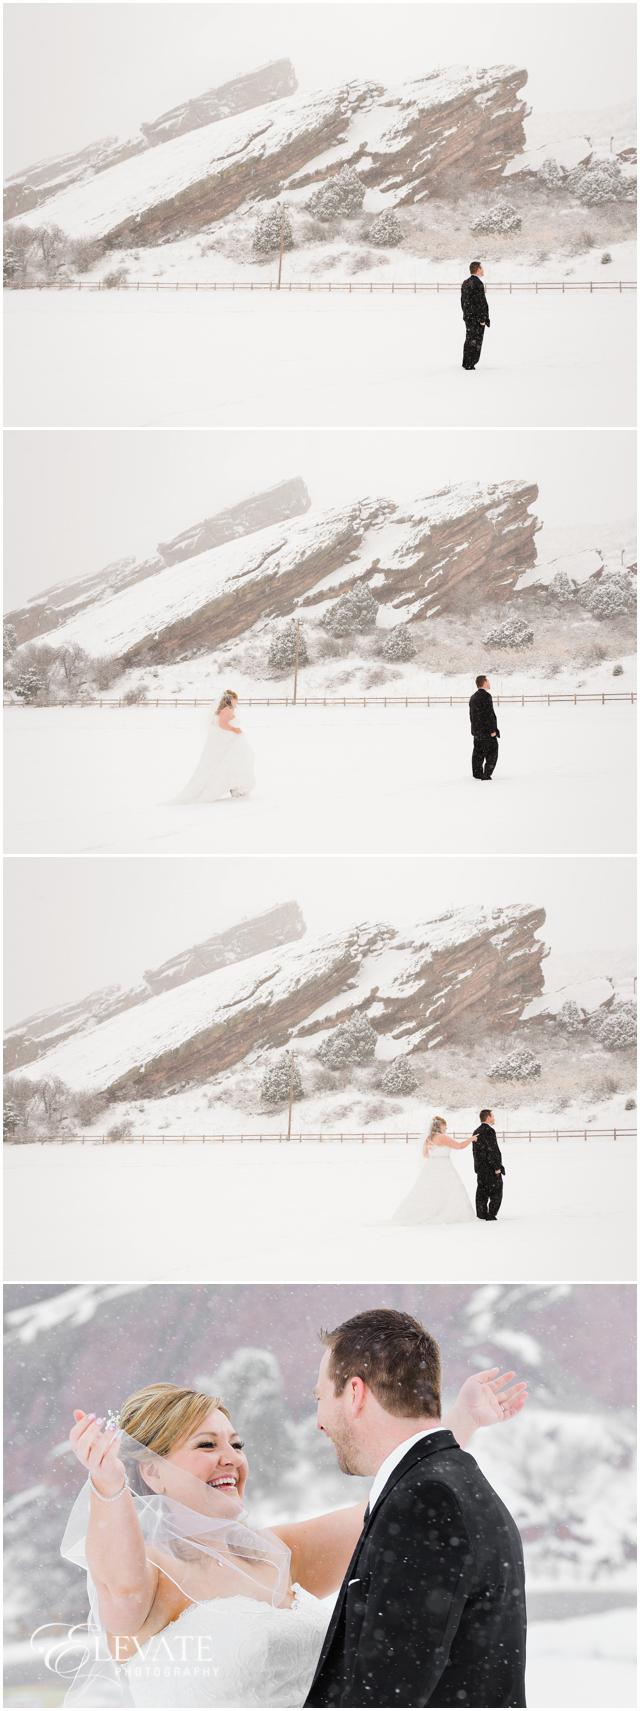 red-rocks-amphitheater-wedding-photos-10